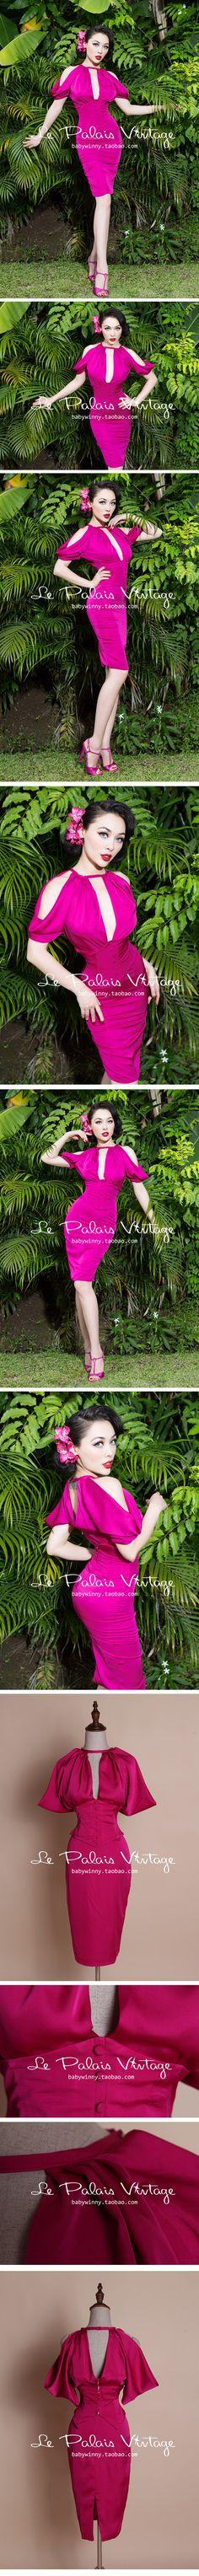 le palais vintage限量玫紫色低胸露肩修身包臀连衣裙 送腰封0.3-淘宝网全球站